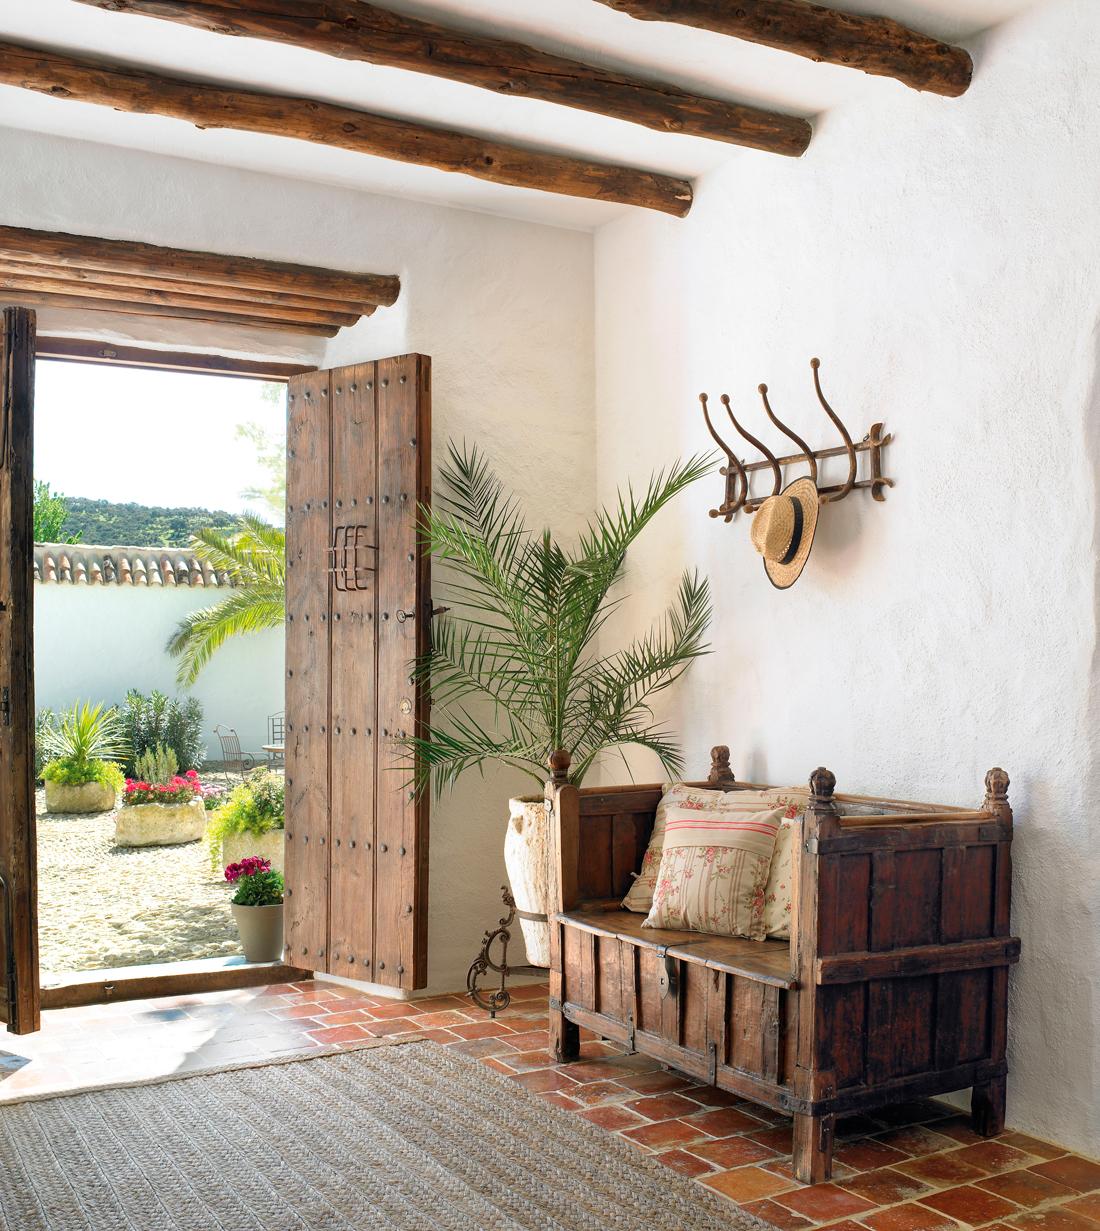 C mo restaurar un mueble antiguo - Muebles antiguos malaga ...